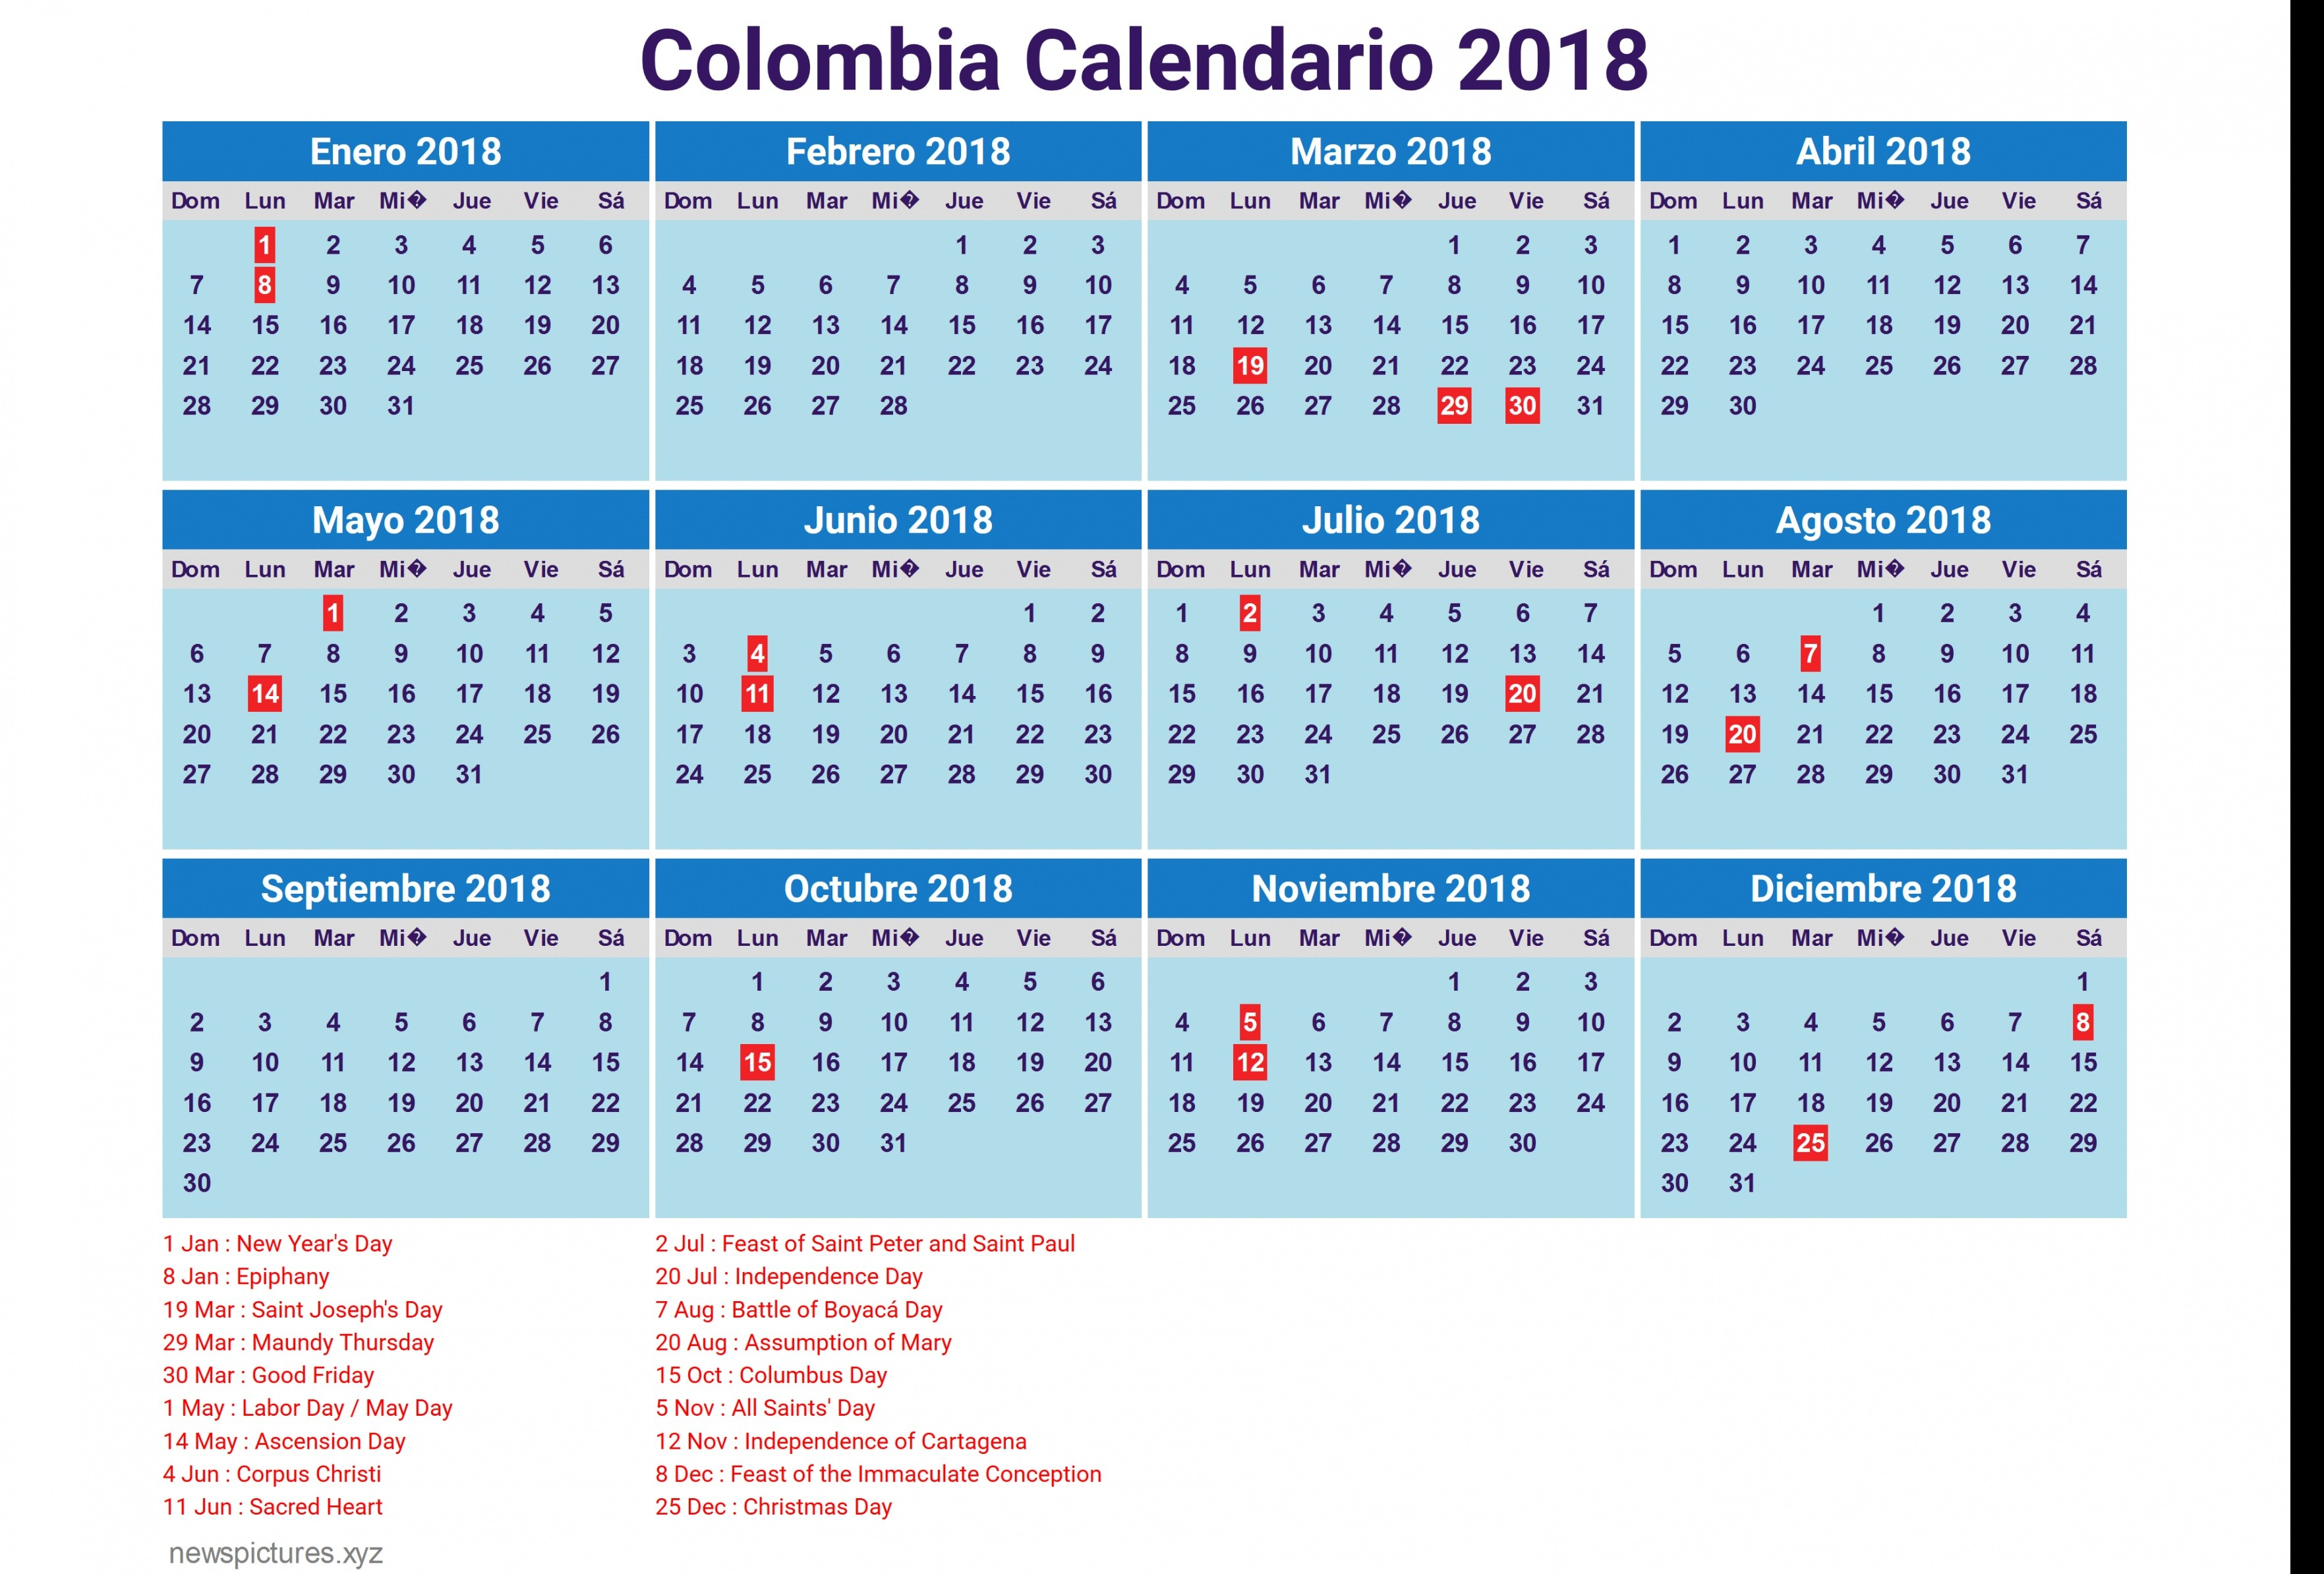 Calendario 2018 Con Festivos — Fiesta de lamusica medellin